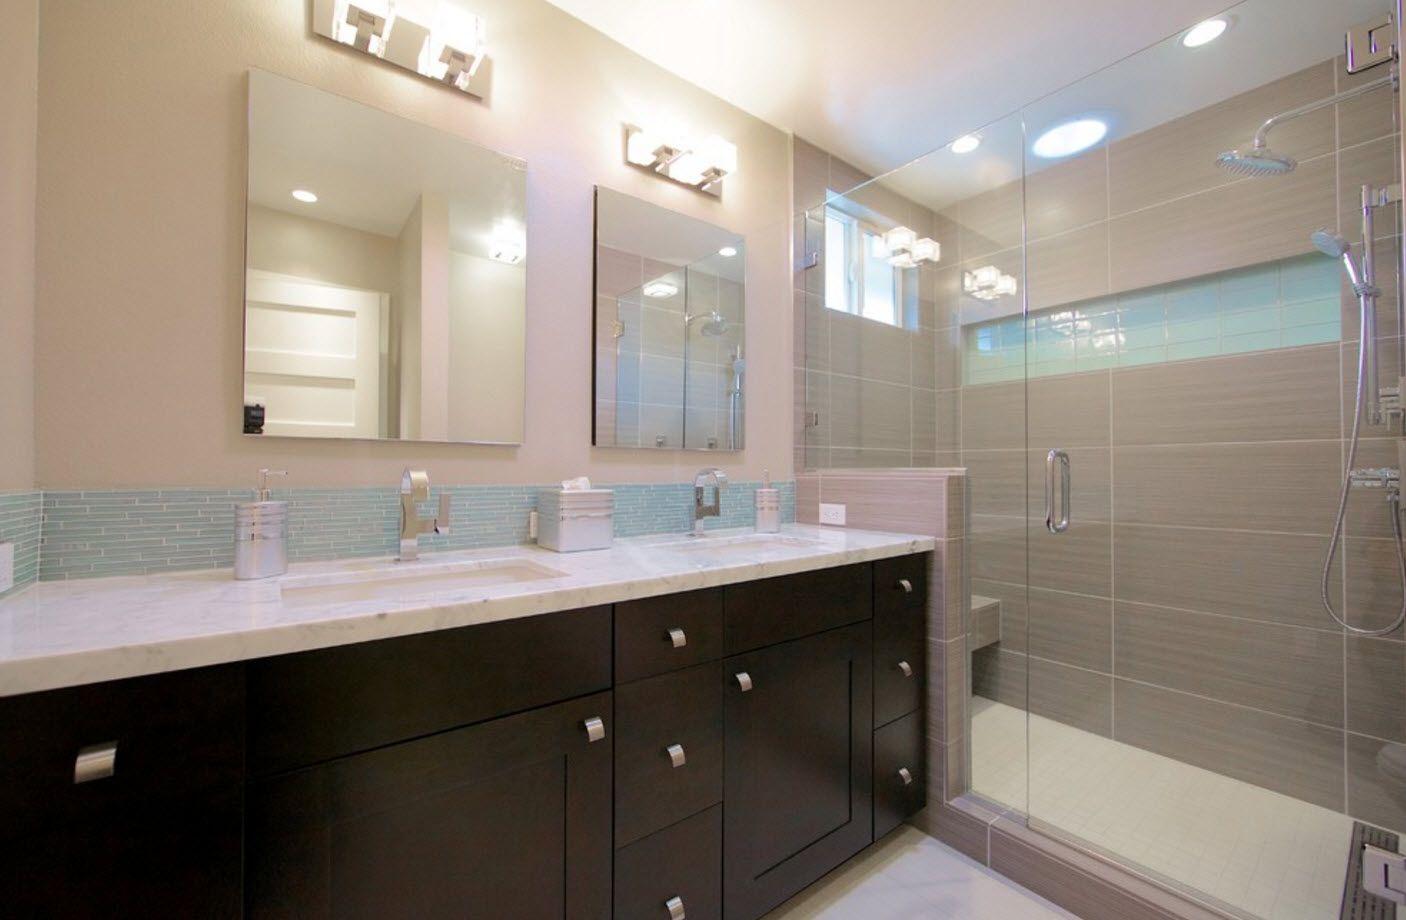 Bathroom Design Trends Amp Decoration Ideas 2017 Small